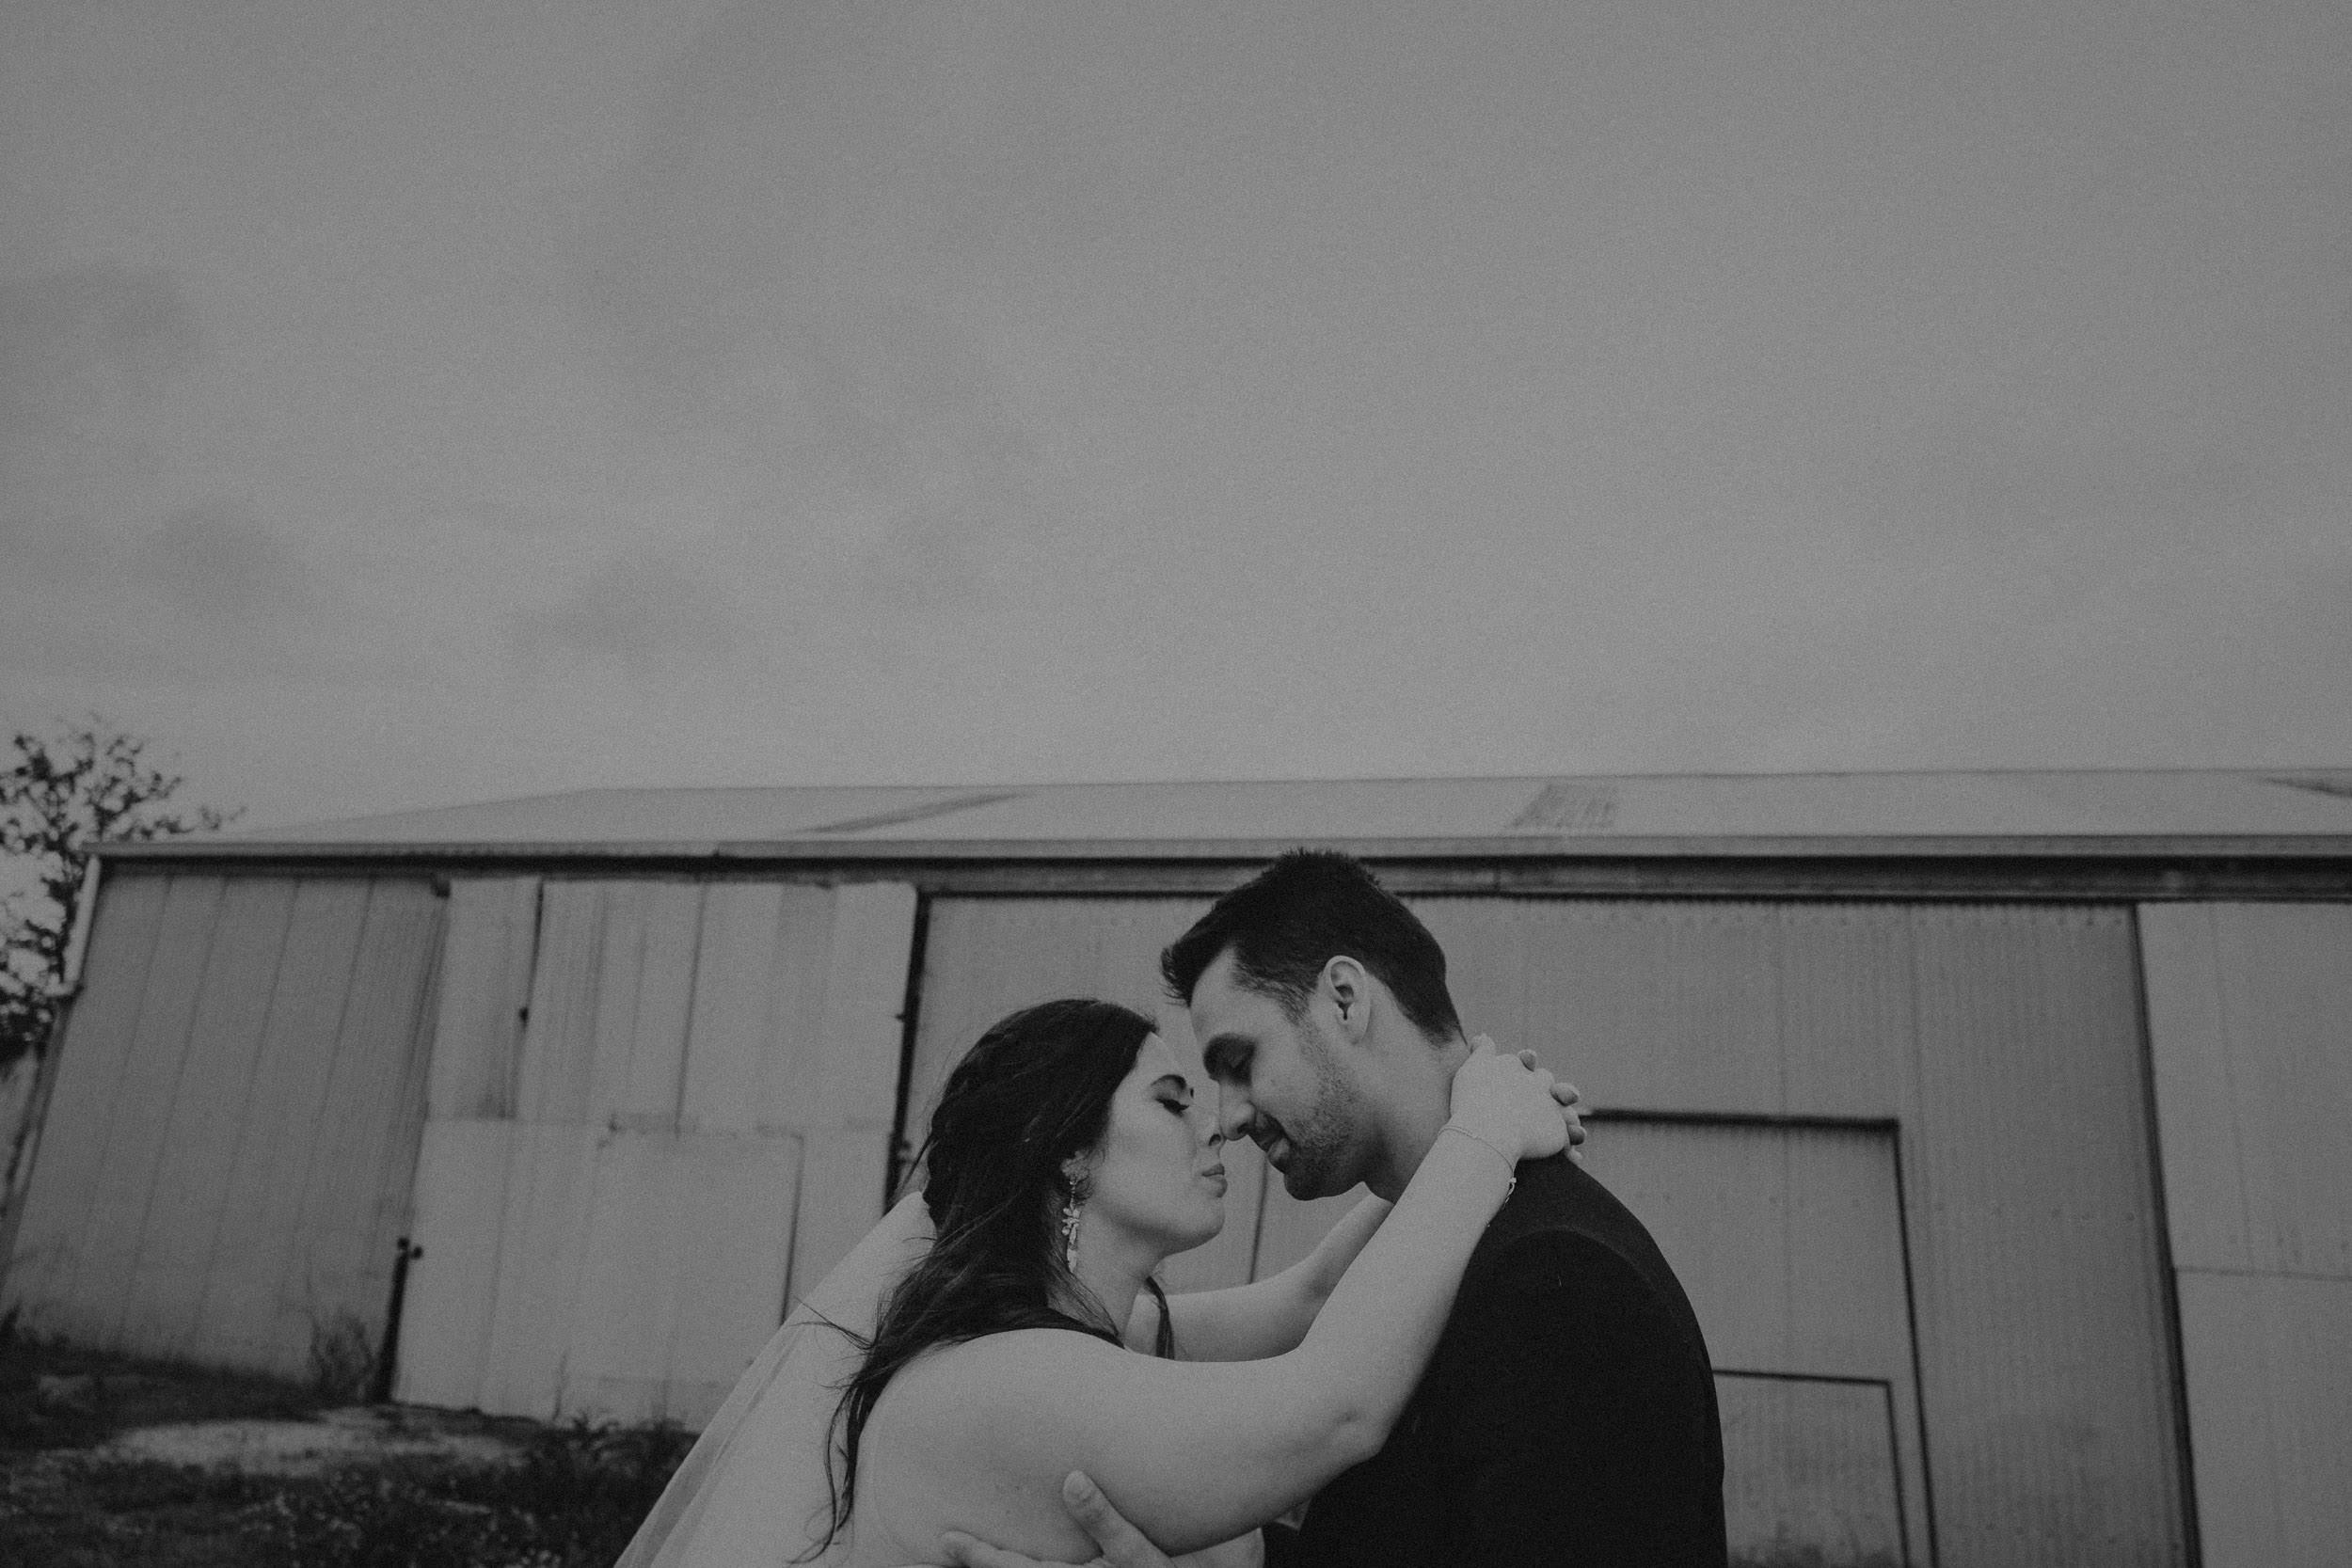 s+j_top_elopement wedding photography_kings & thieves_blog - 398.jpg